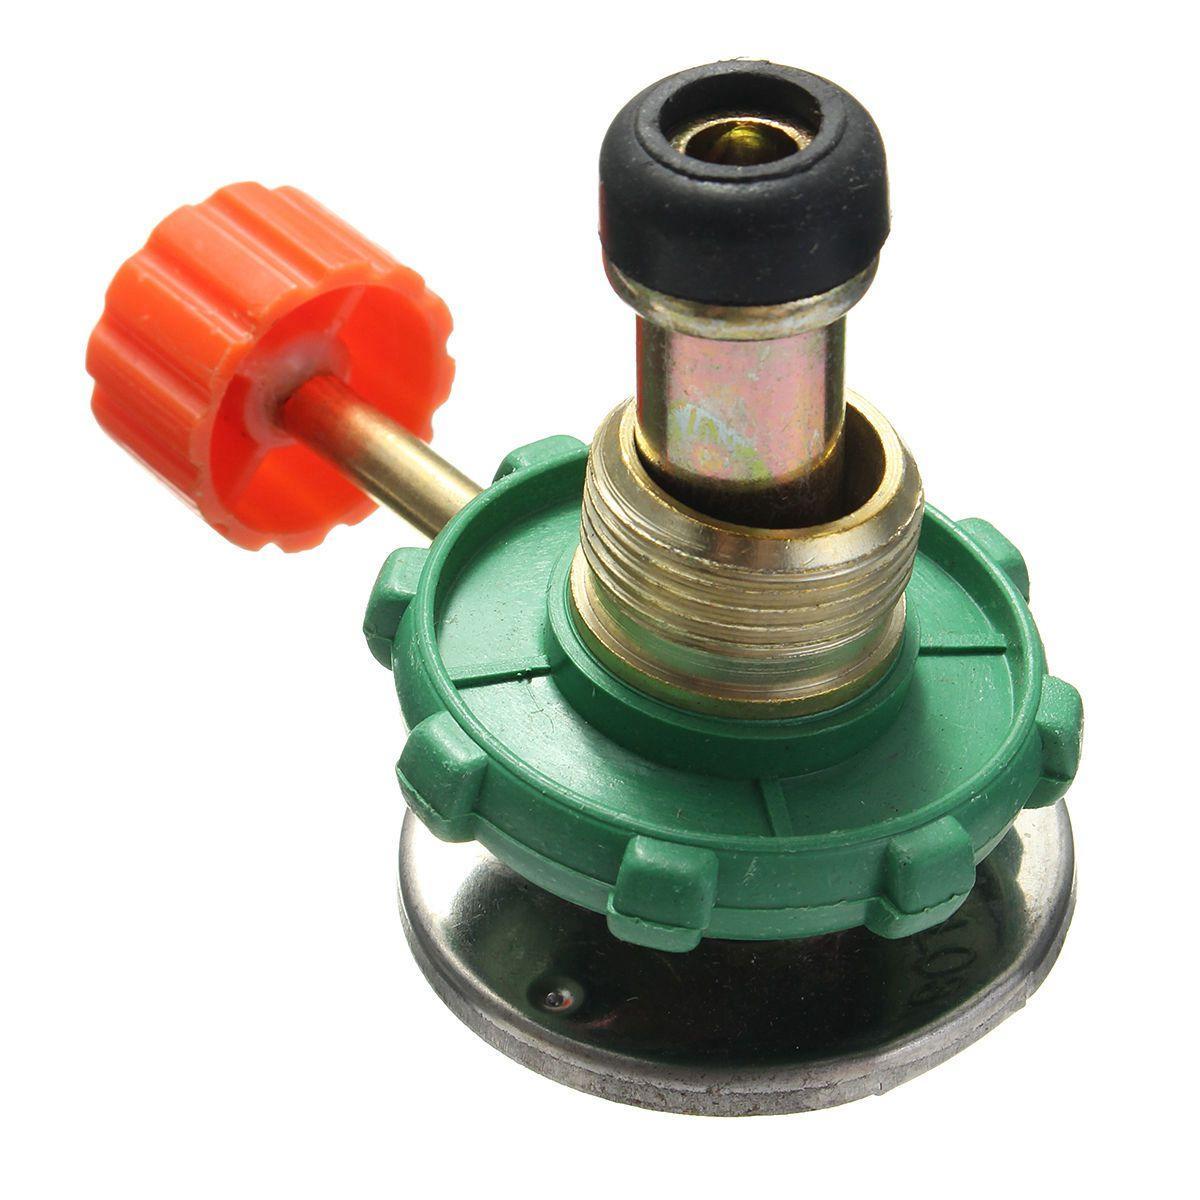 1pc <font><b>Propane</b></font> Adapter Lp Gas Tank Coupler